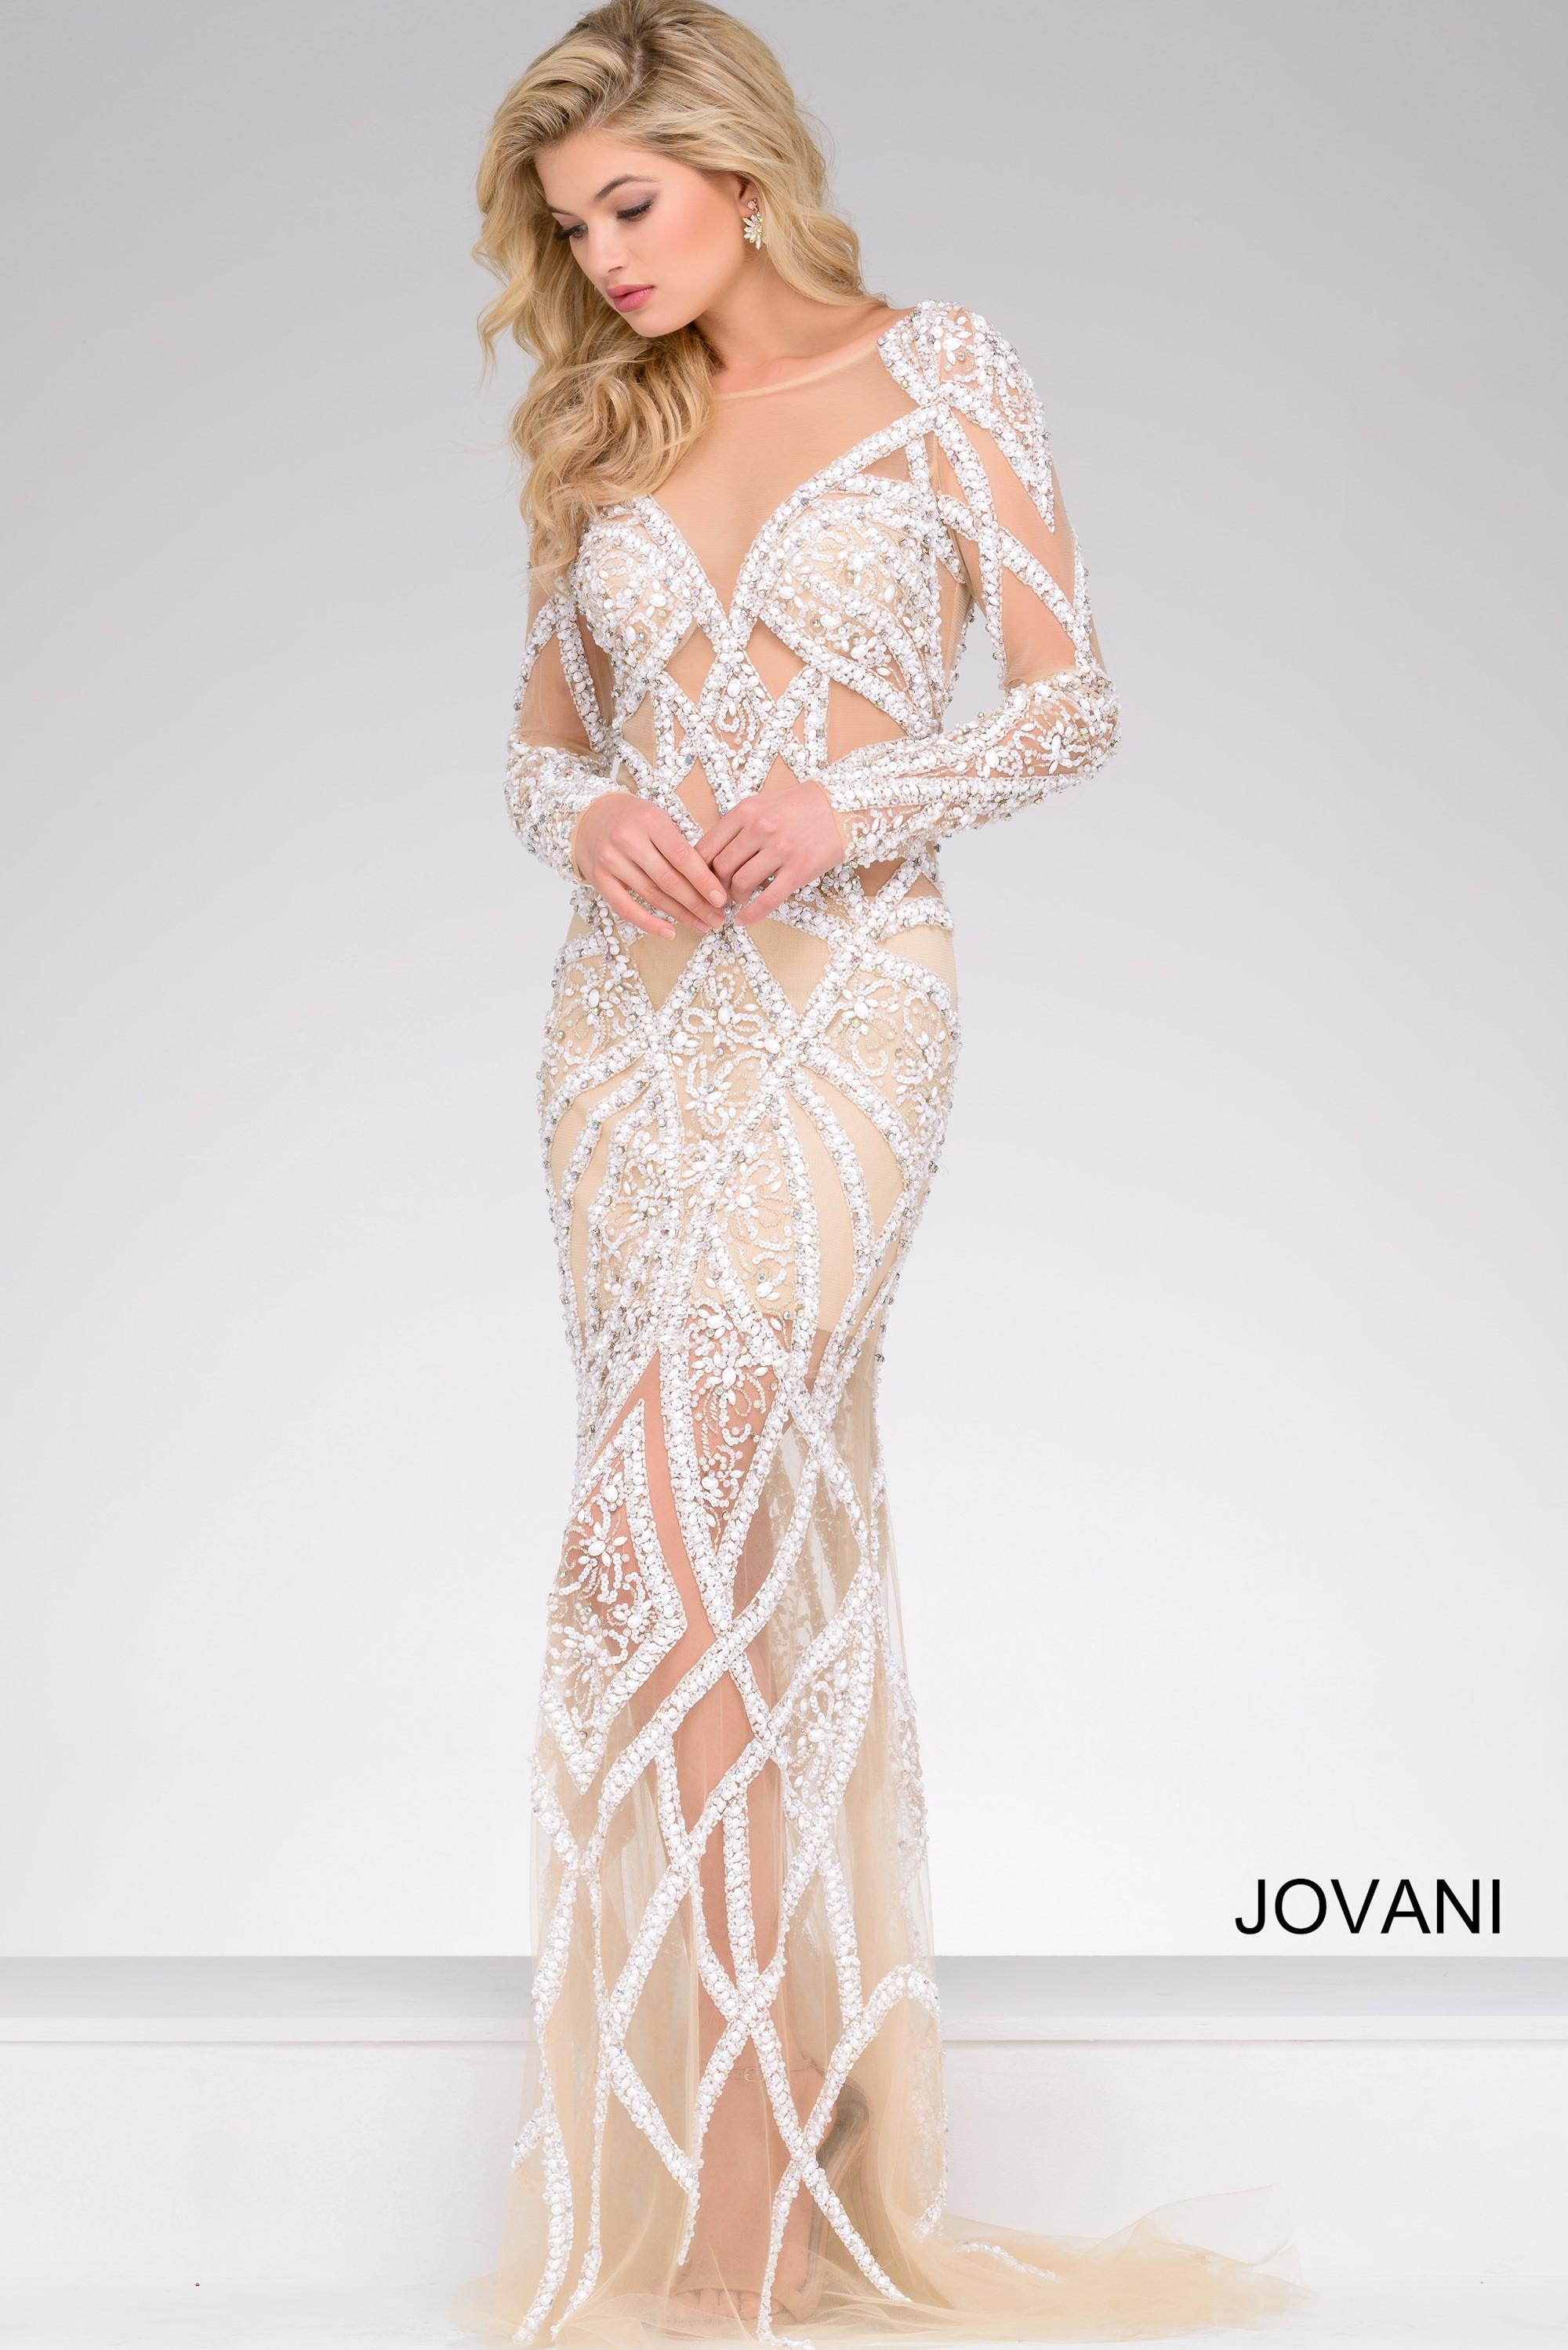 Jovani - 32202   Regiss